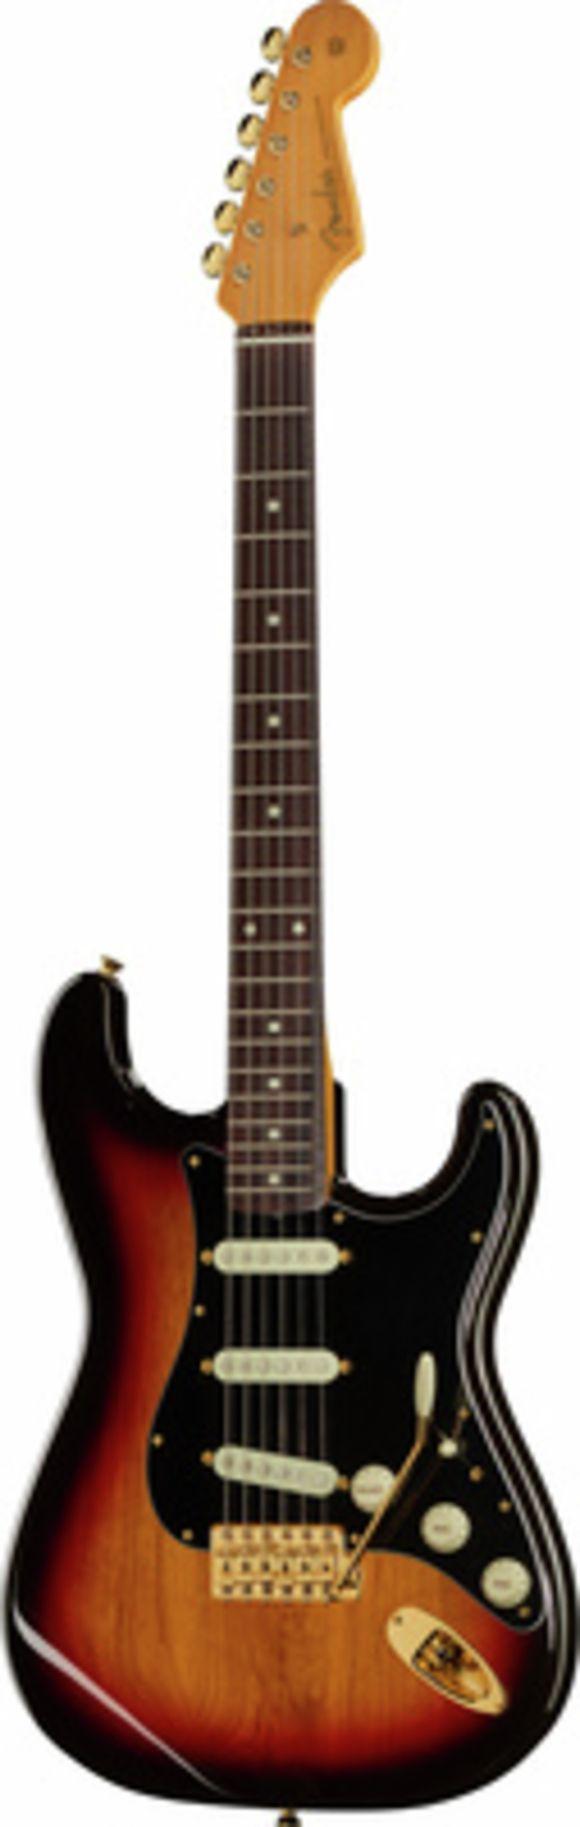 Traditional 60s Strat 3CSB Fender